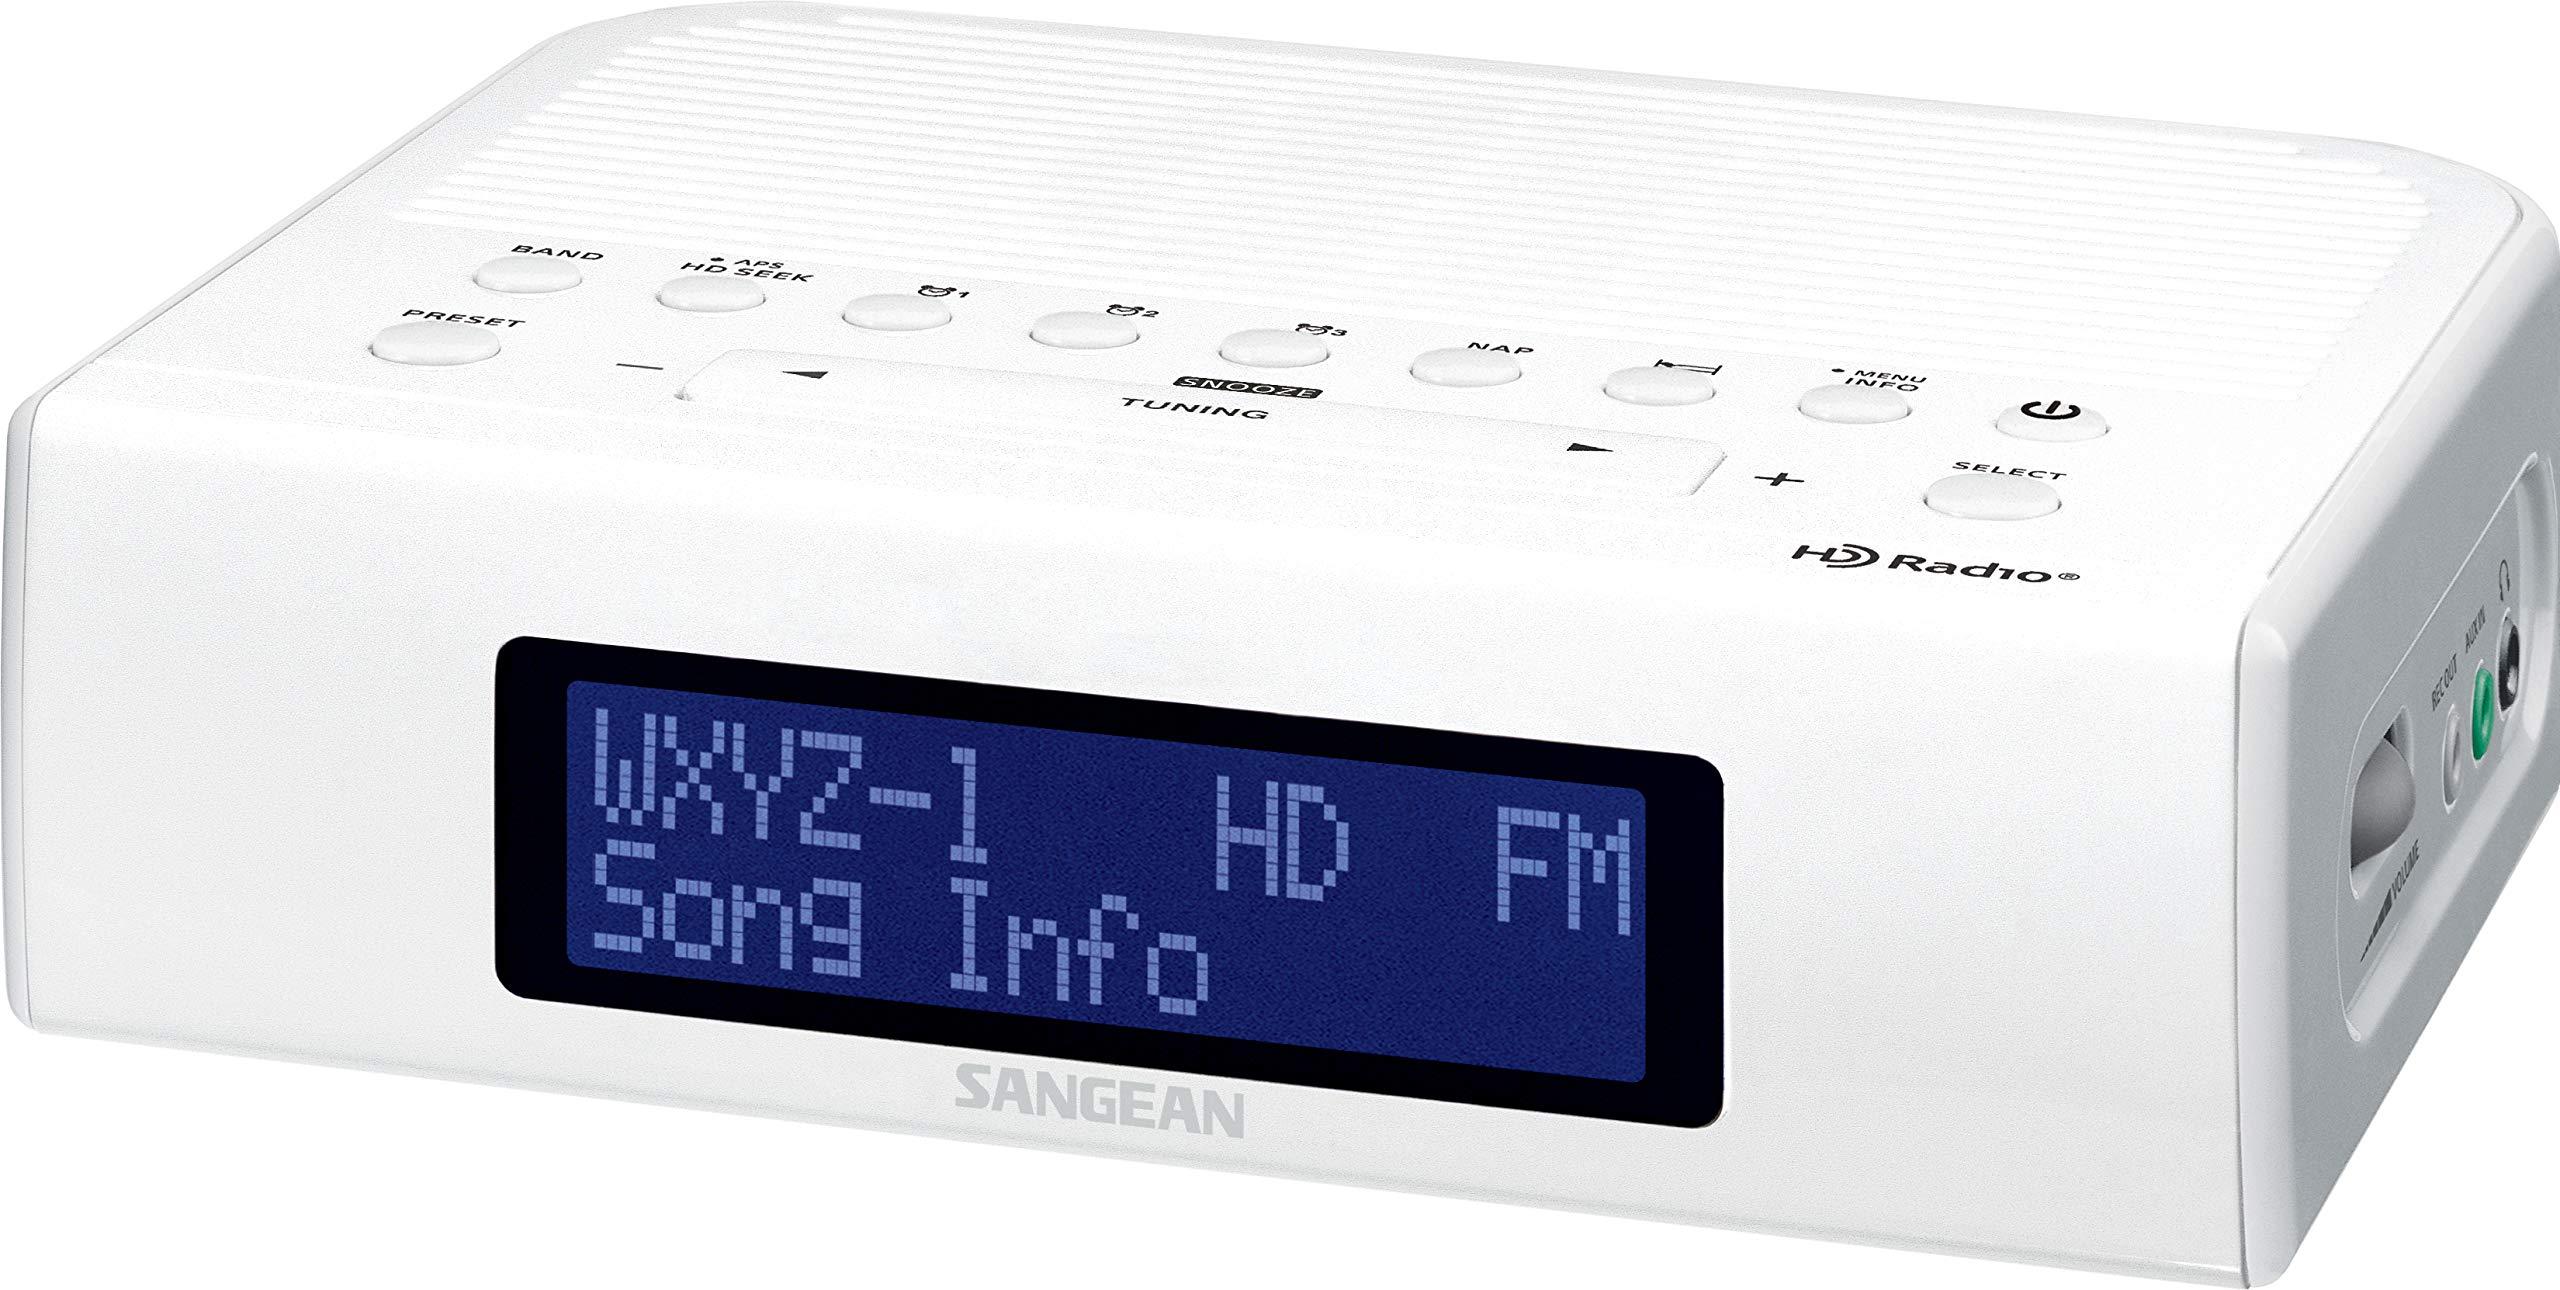 Sangean HDR 15 Fm Rbds Digital Charging